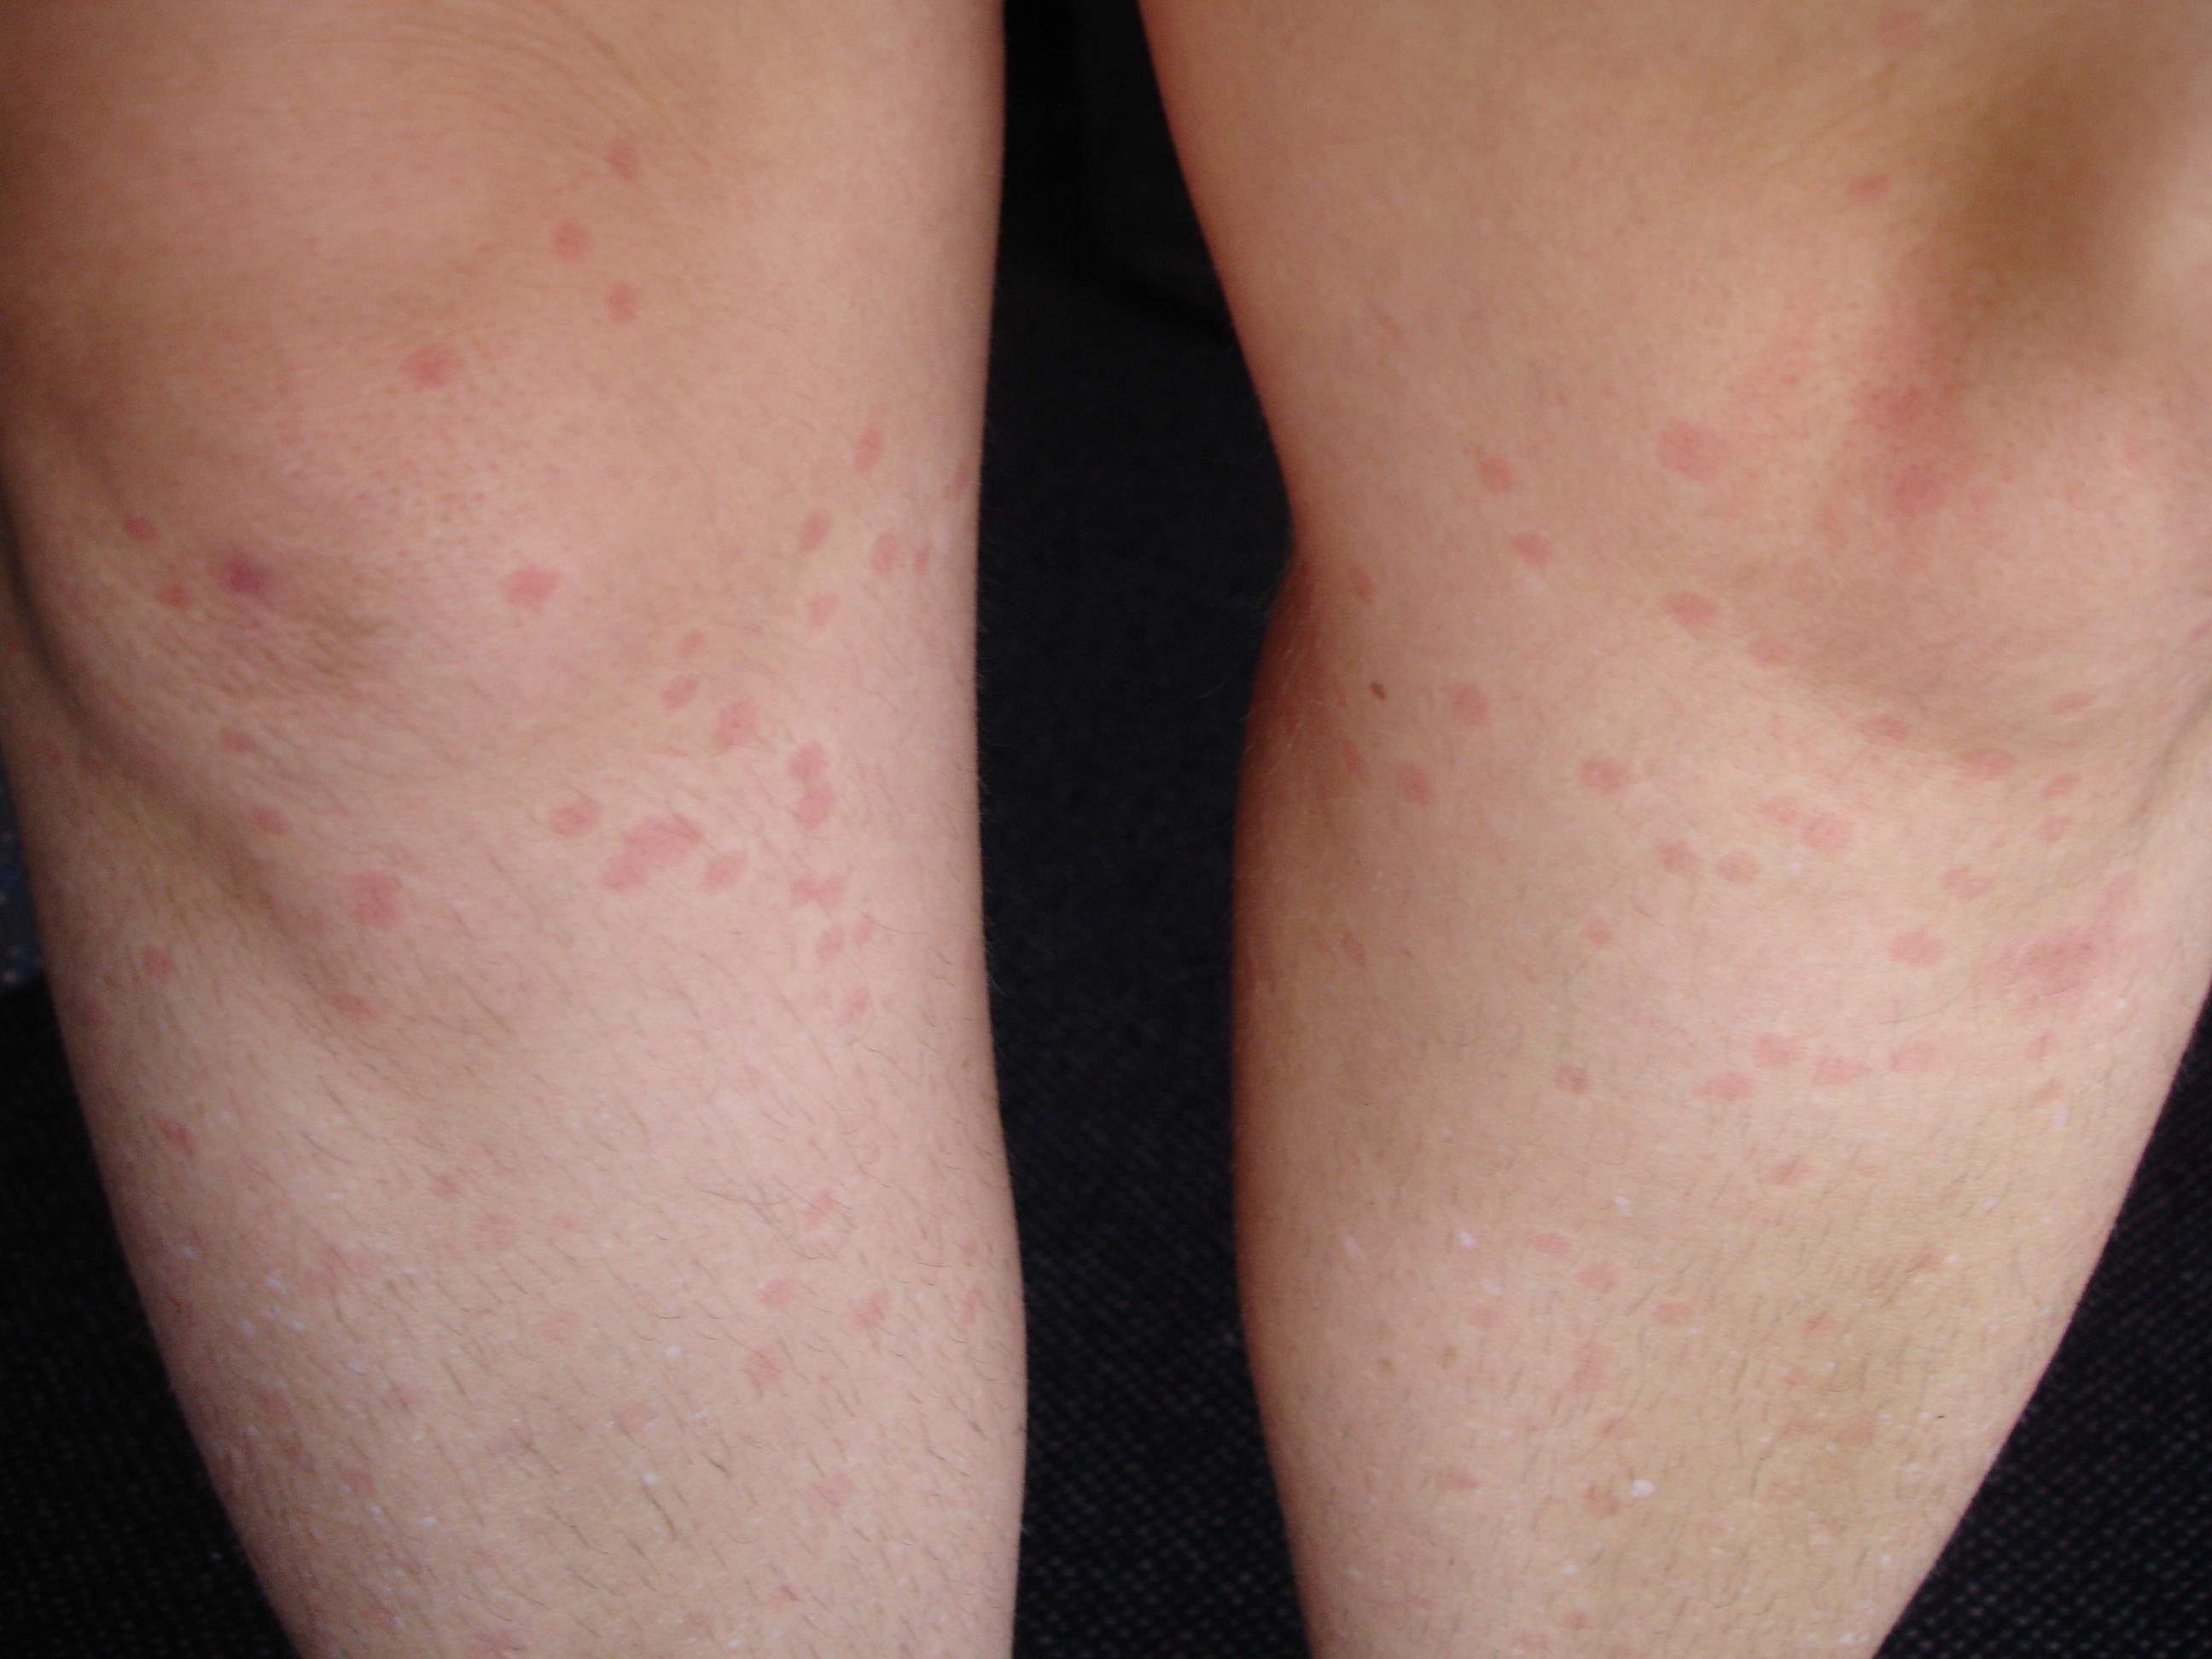 Flea Bites : Symptoms and Treatments - Health Line